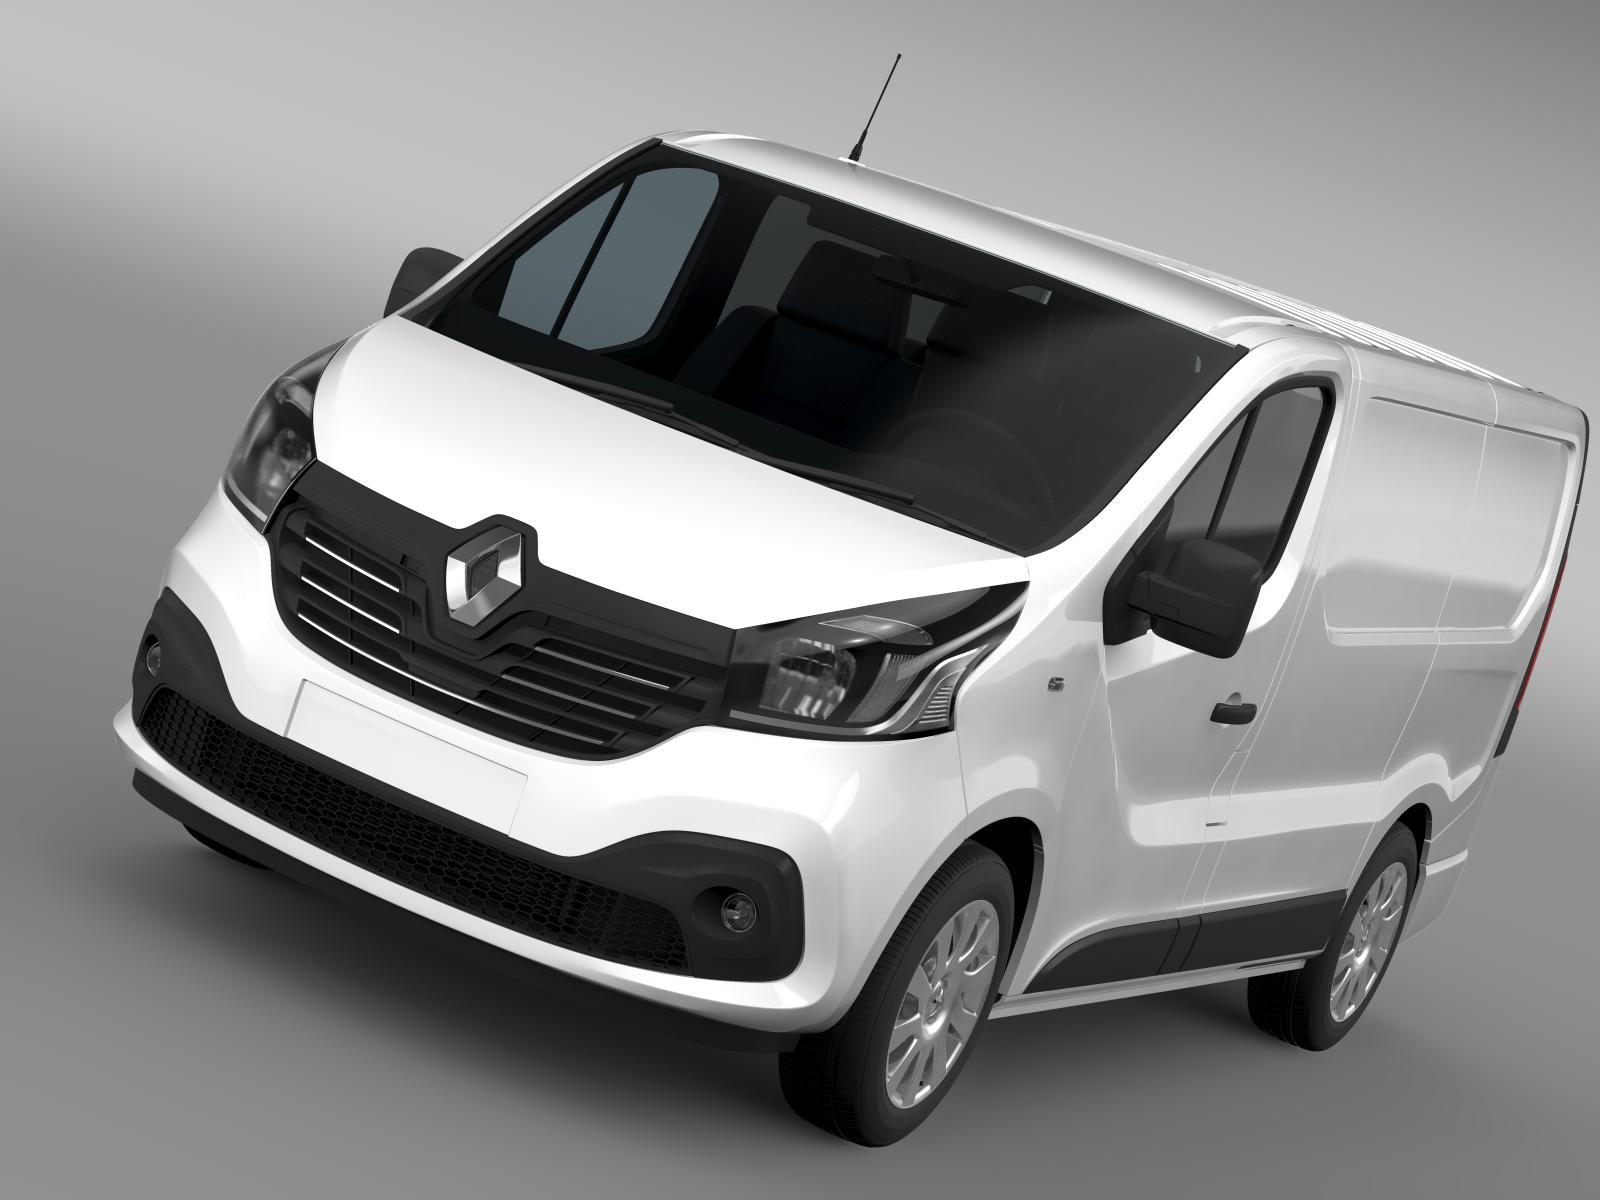 renault trafic furgons 2015 3d modelis 3ds maks.